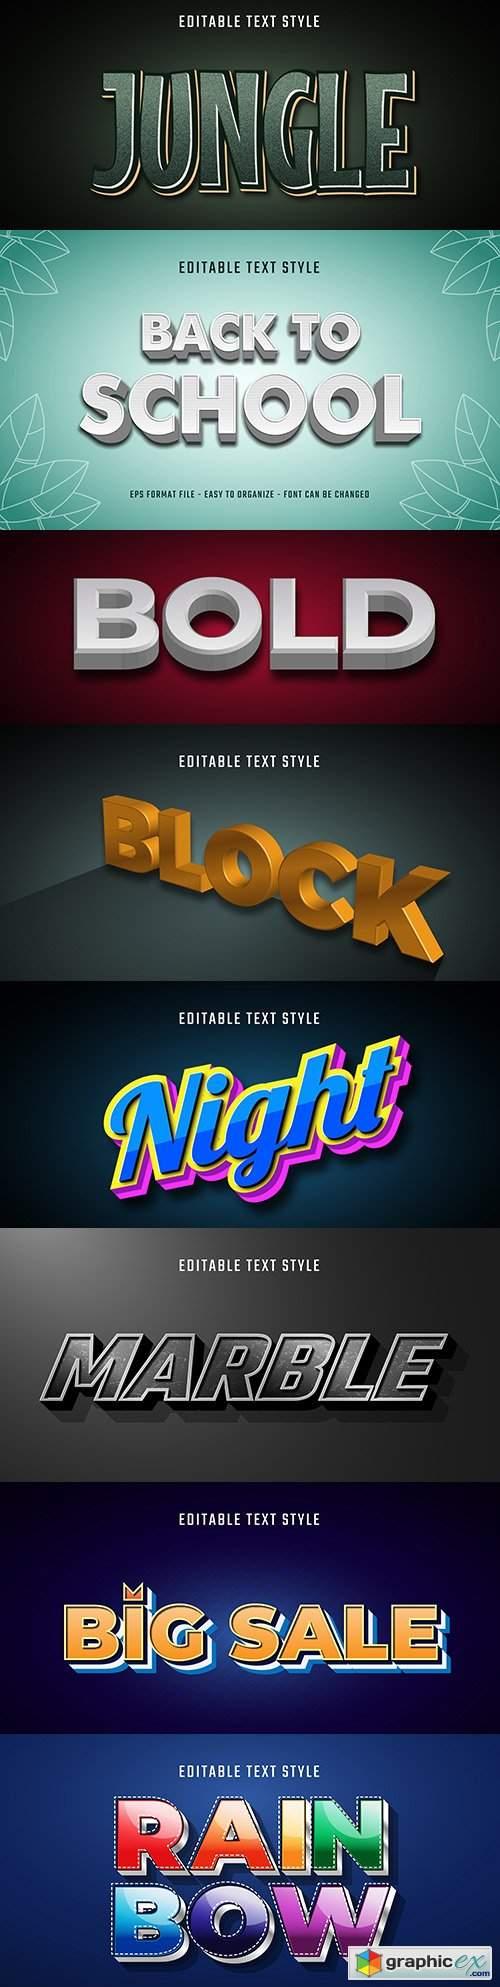 Editable font effect text collection illustration design 154